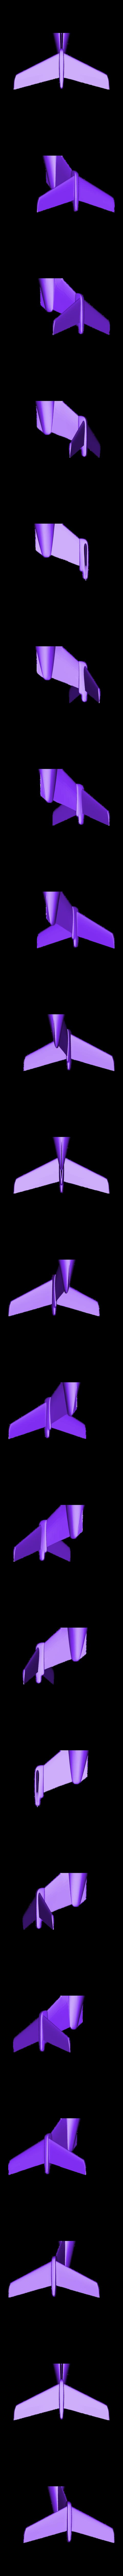 Cone.STL Download STL file Phenom 300 • Template to 3D print, Eduardohbm